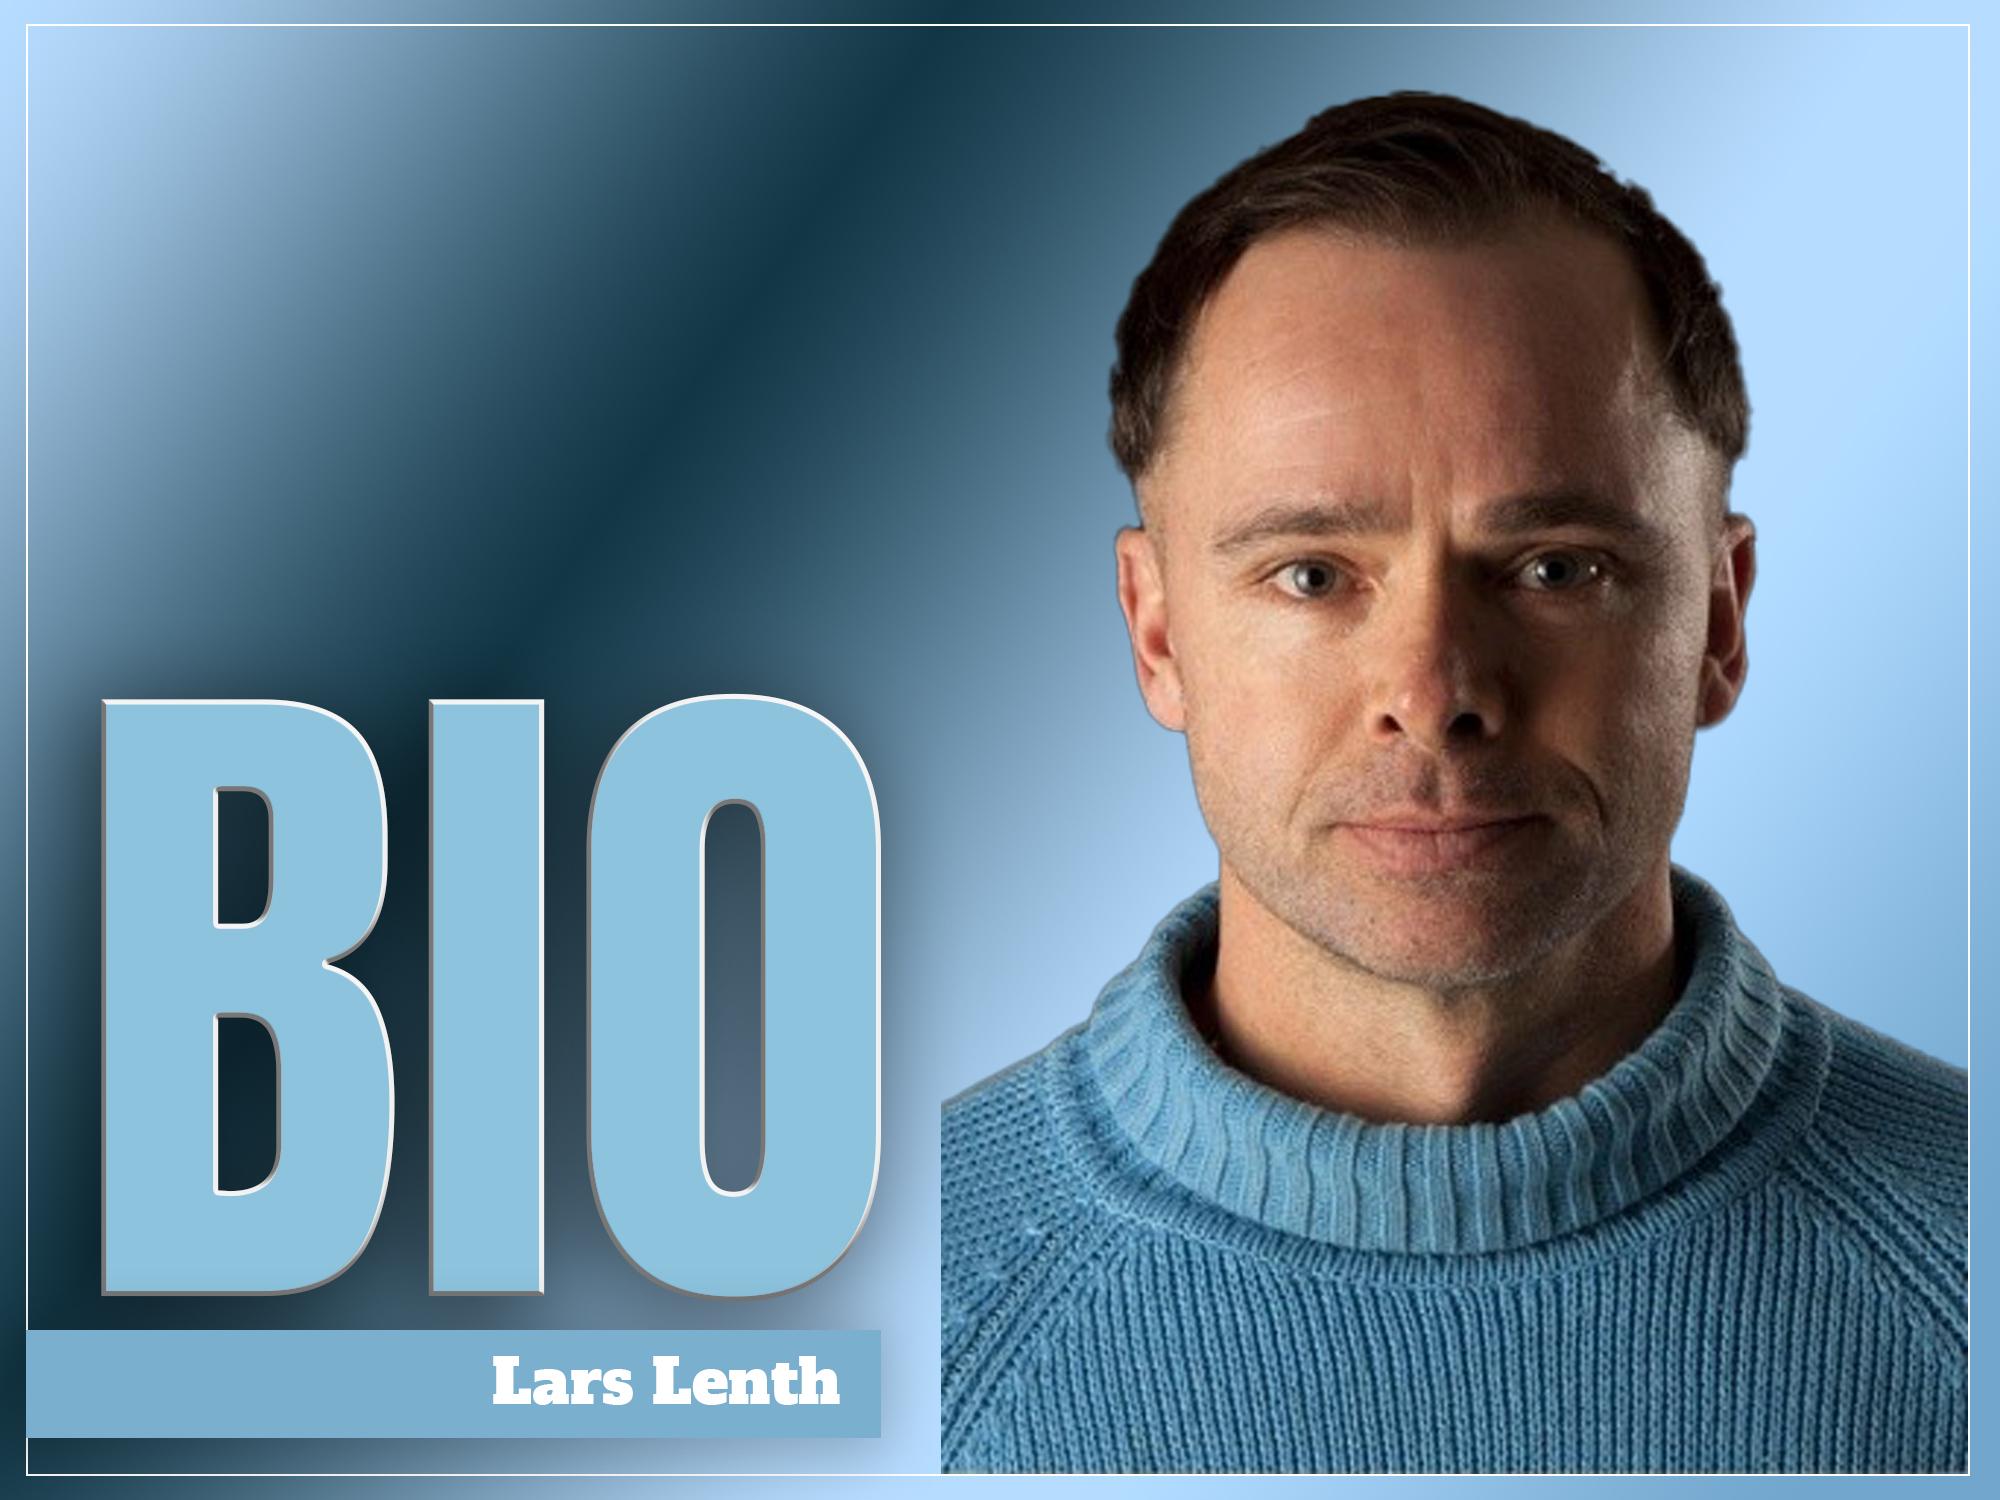 Lars Lenth